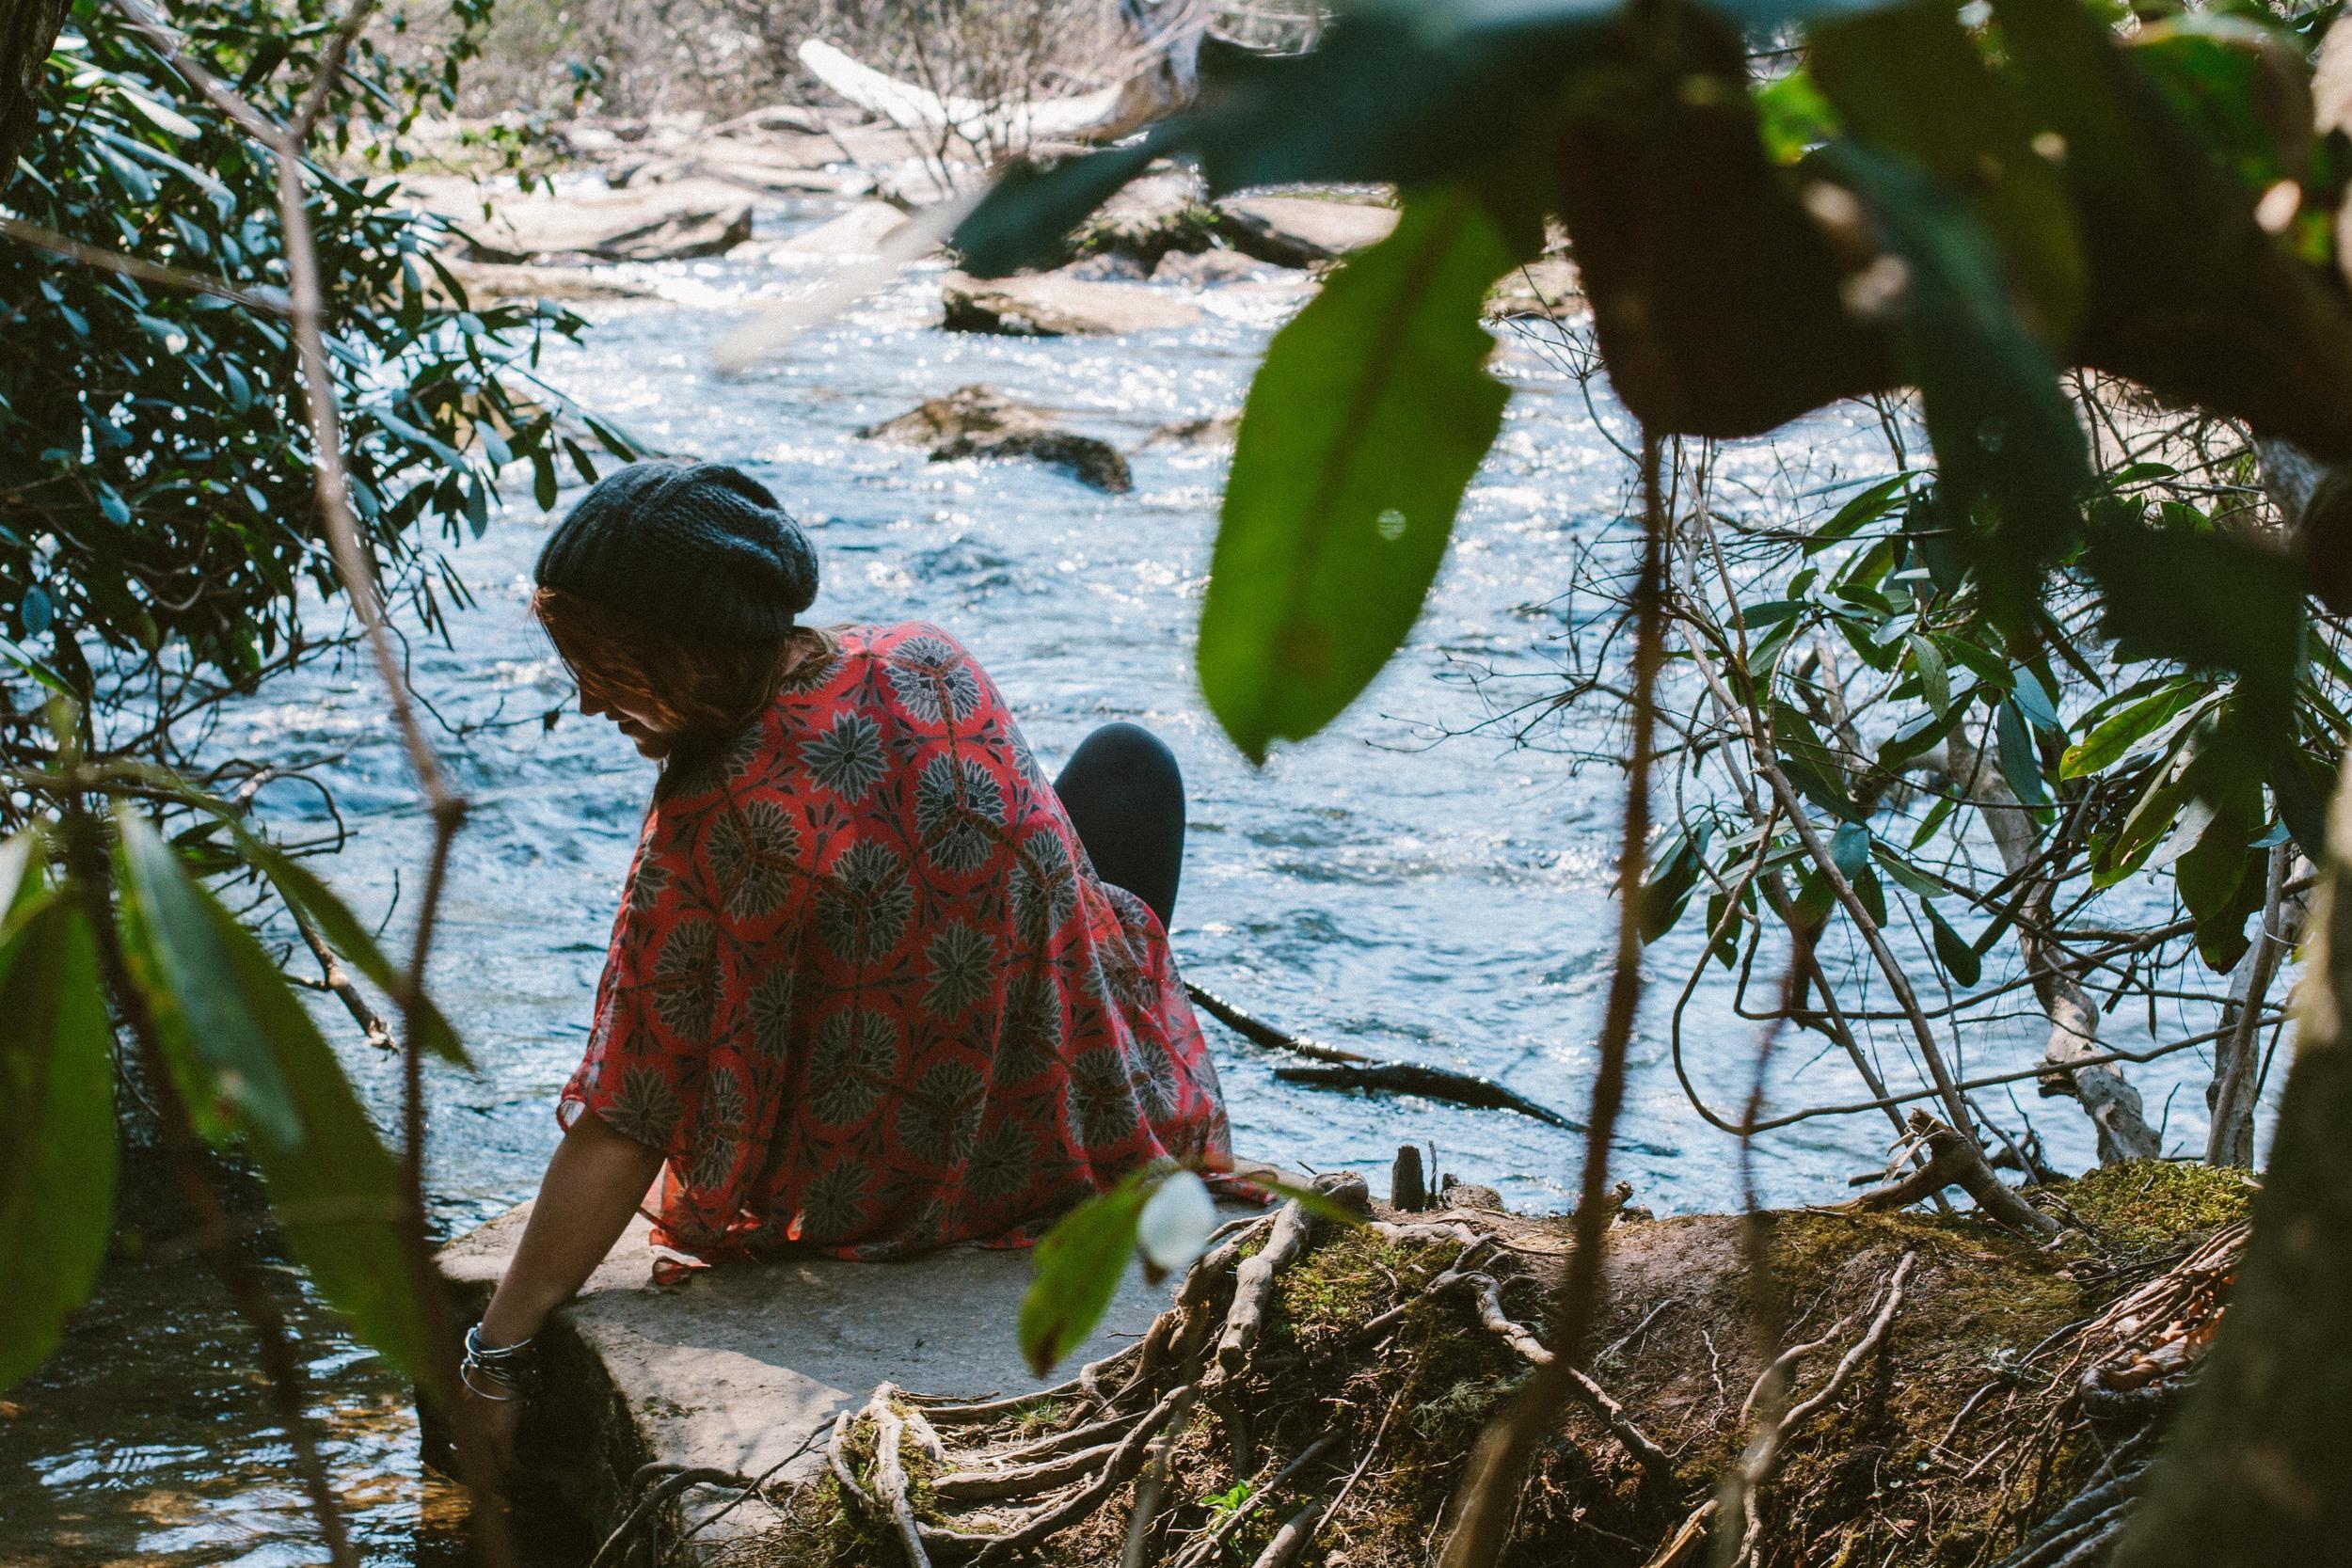 THE ETERNAL CHILD // NORTH CAROLINA PART I // A TRIP TO TRIPLE FALLS